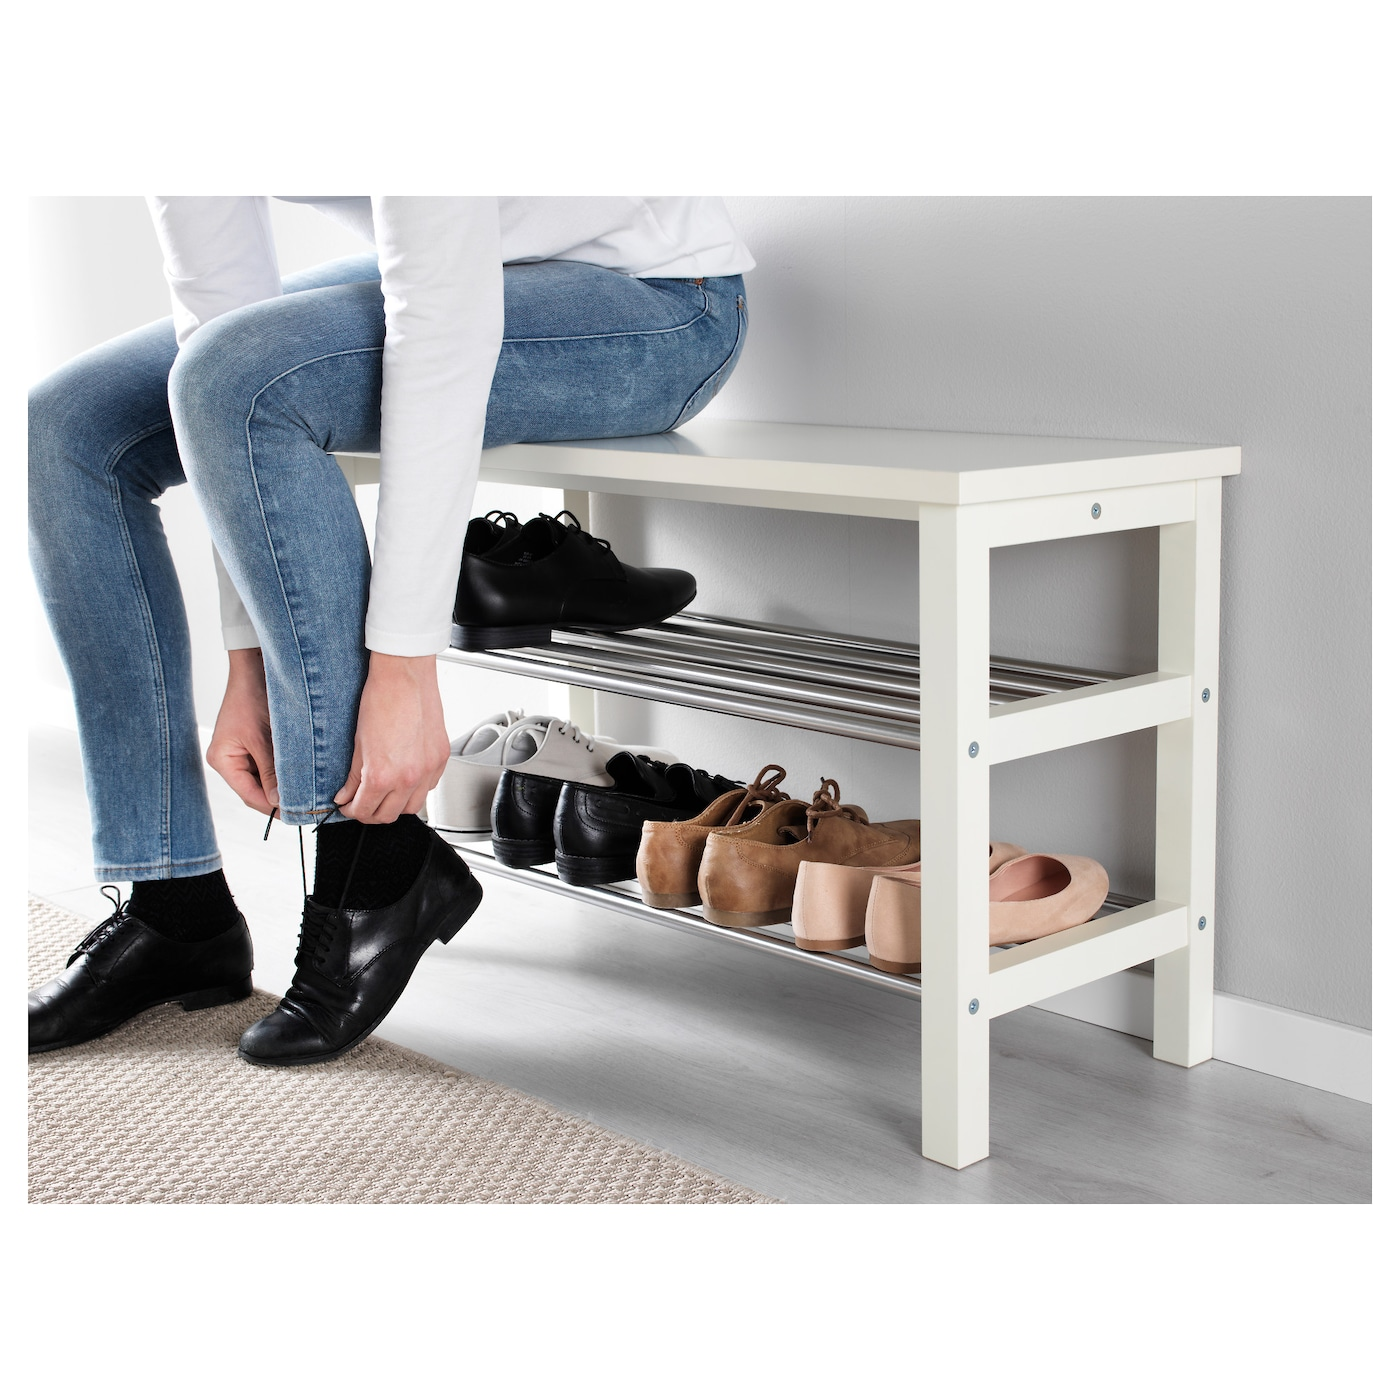 tjusig banc avec rangement chaussures blanc 81 x 50 cm ikea. Black Bedroom Furniture Sets. Home Design Ideas